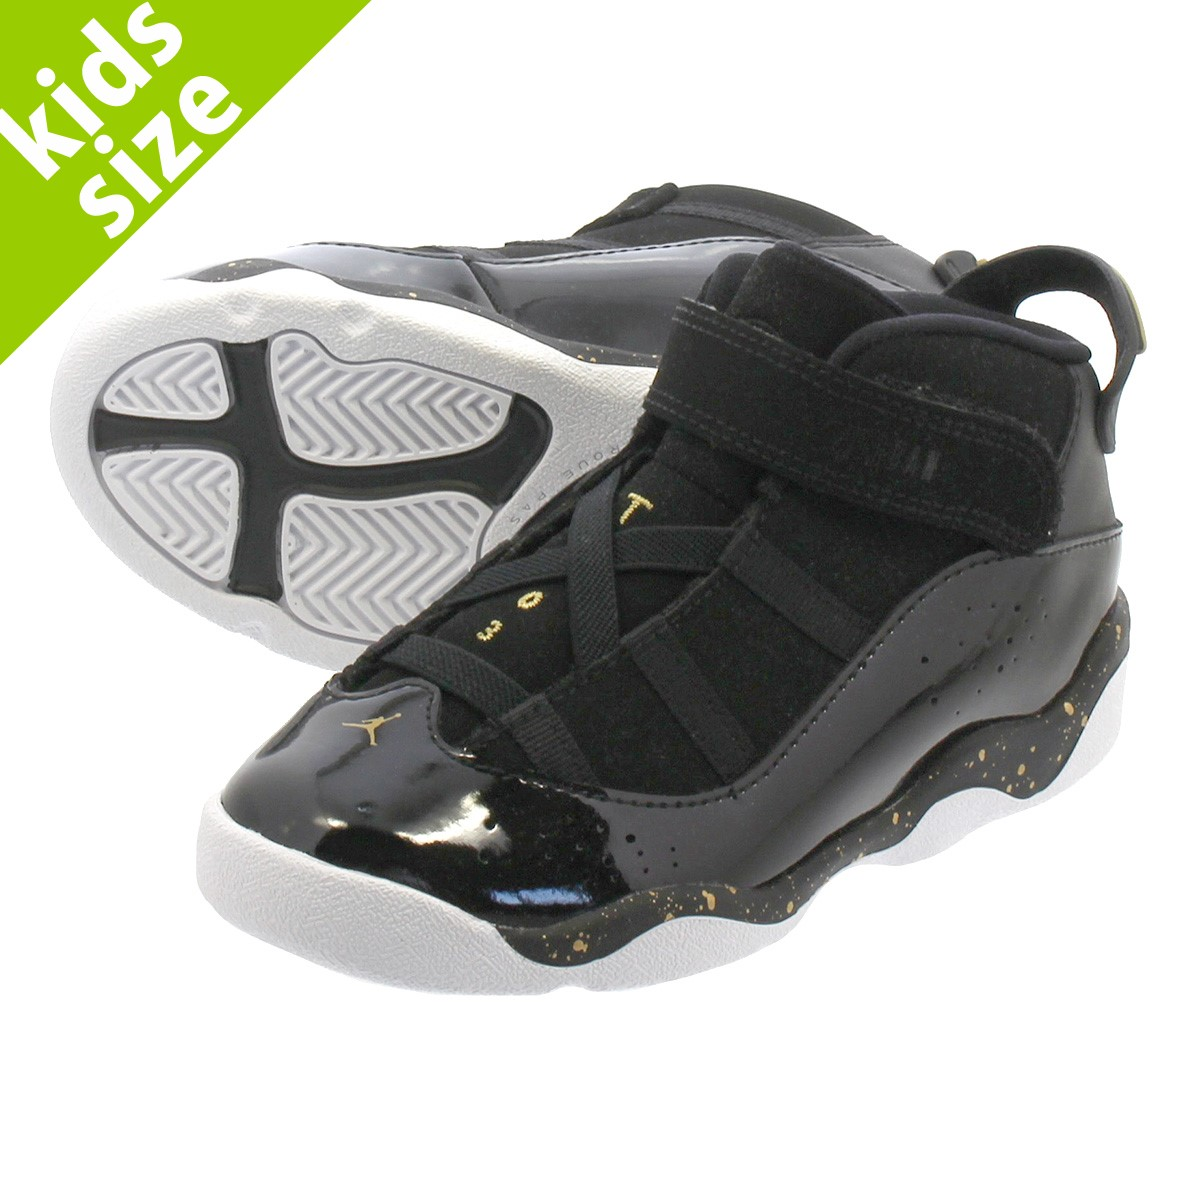 cf620dc286f LOWTEX PLUS: NIKE JORDAN 6 RINGS TD Nike Jordan 6 RINGS Co.,Ltd. TD  BLACK/METALLIC GOLD/WHITE 323,420-007 | Rakuten Global Market